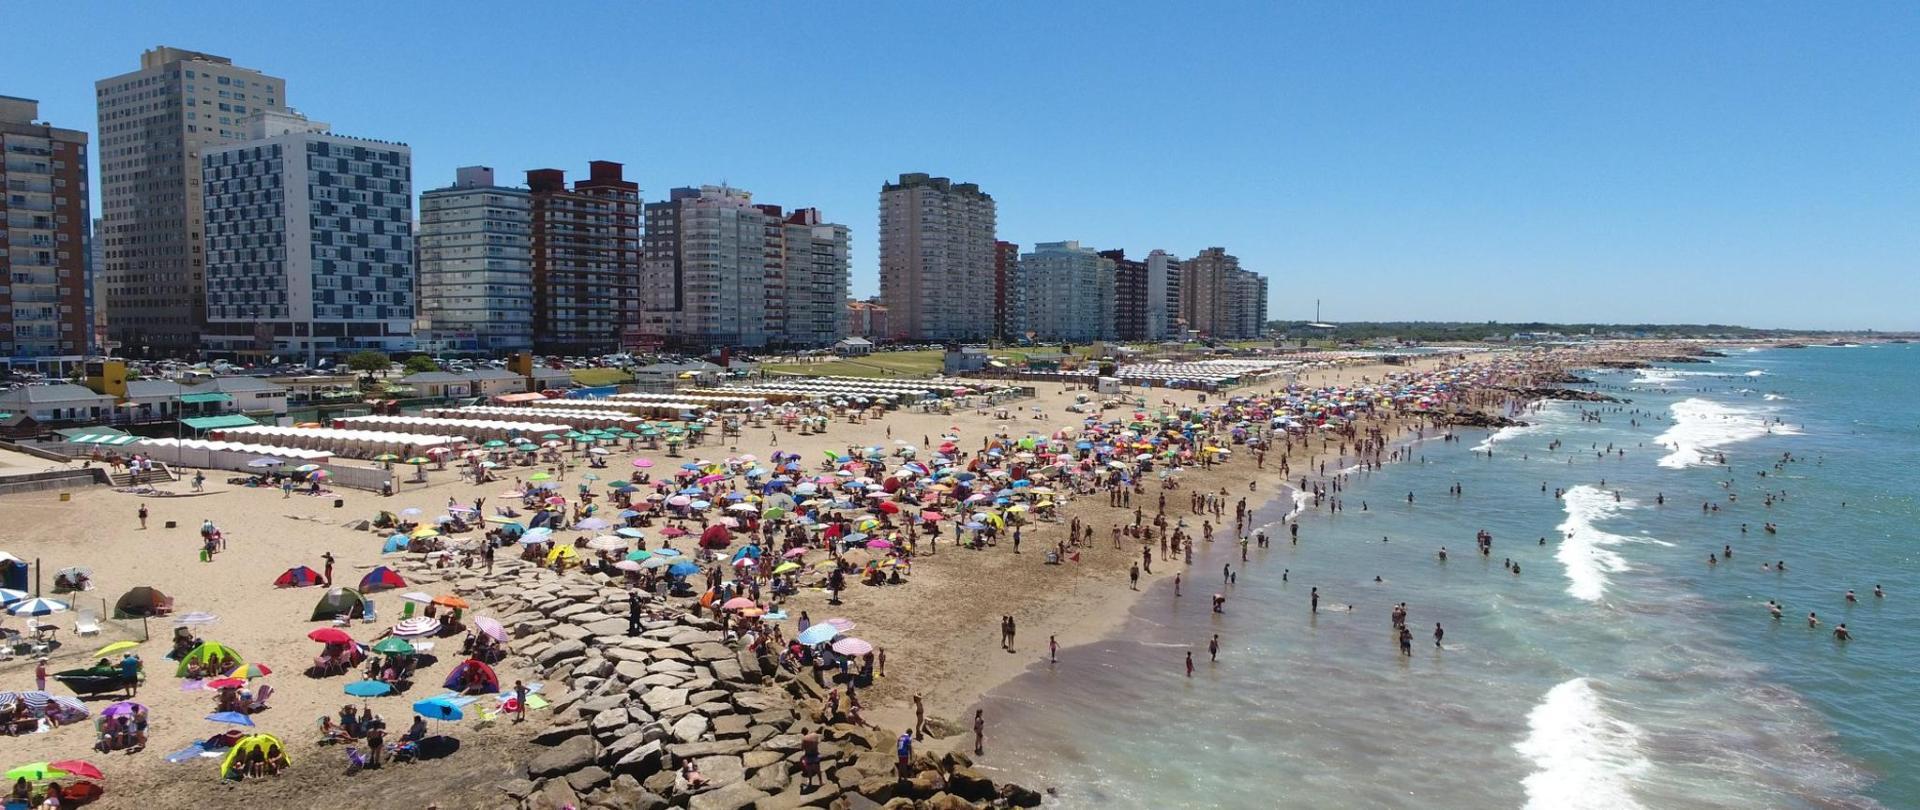 Miramar Verano 2019 Hotel Turingia con carpa gratis.jpg